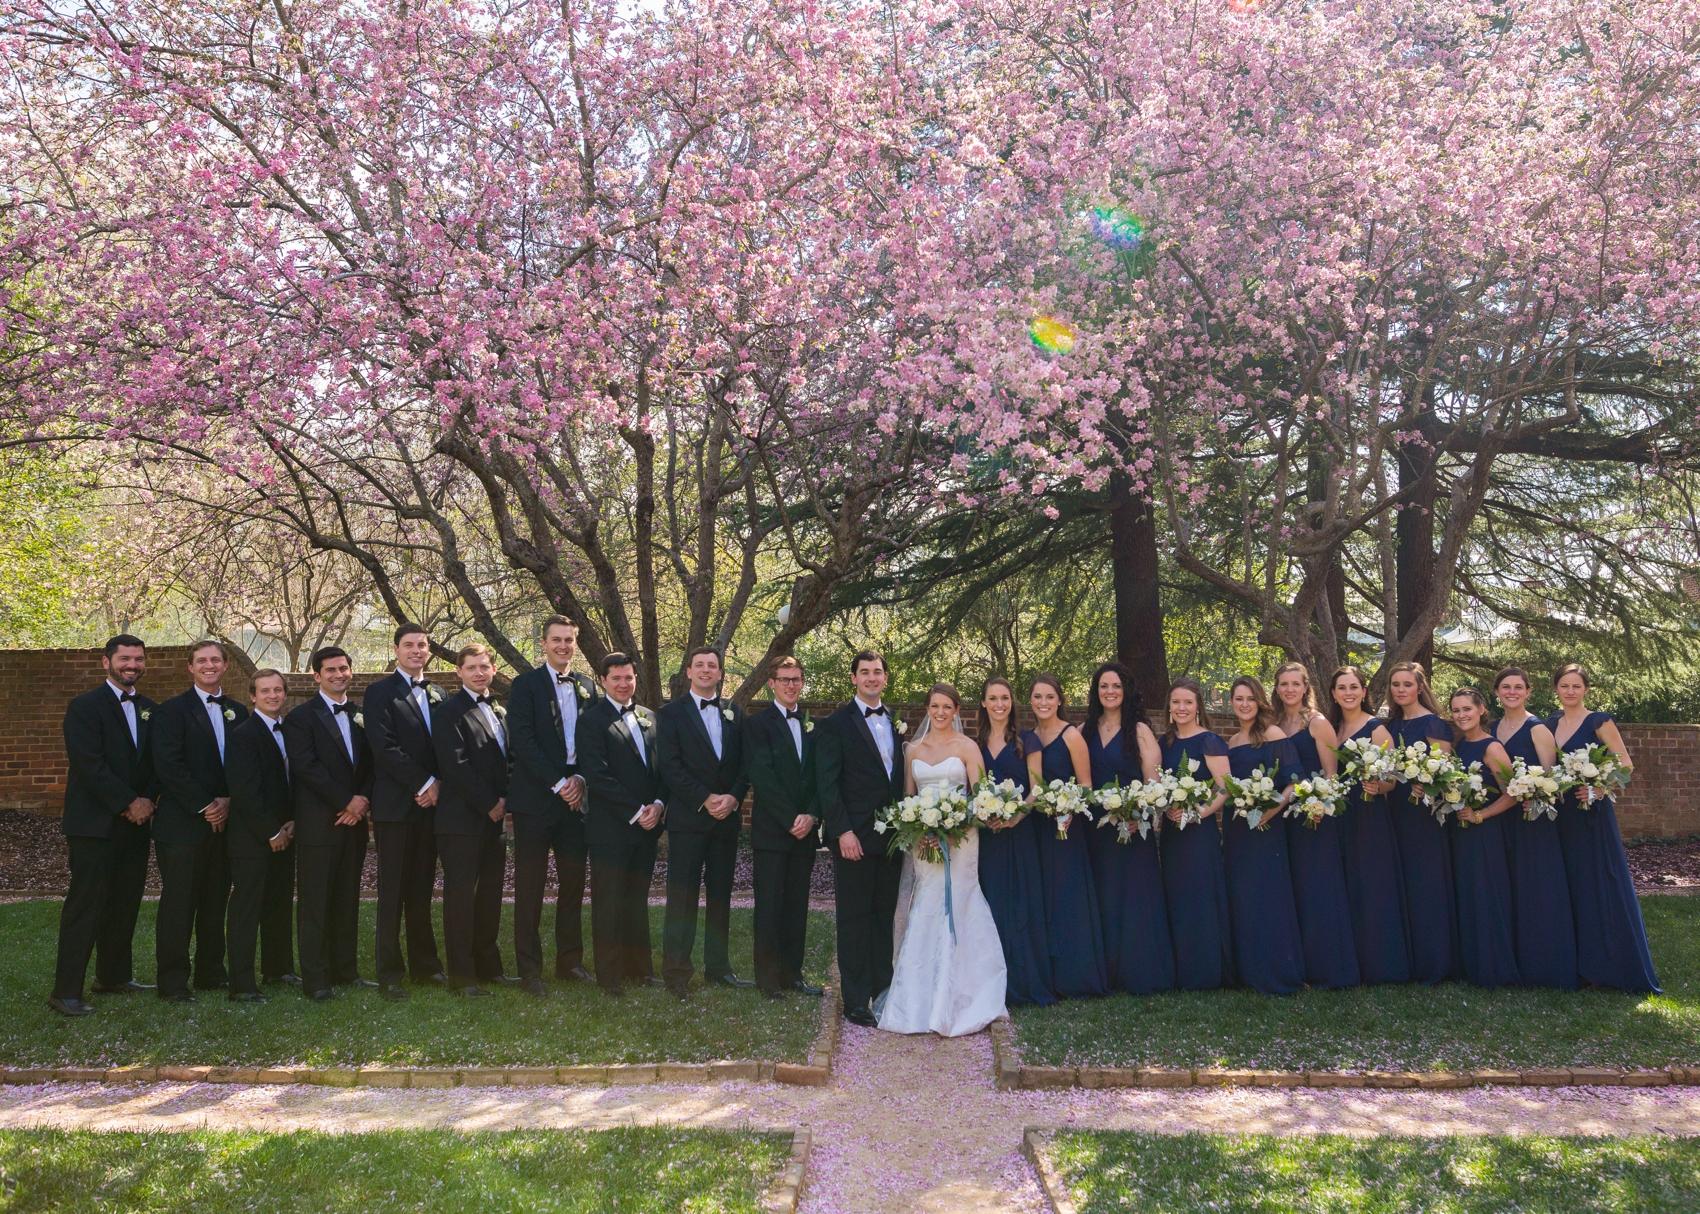 Castle-Hill-Virginia-Wedding-2019-0533.jpg